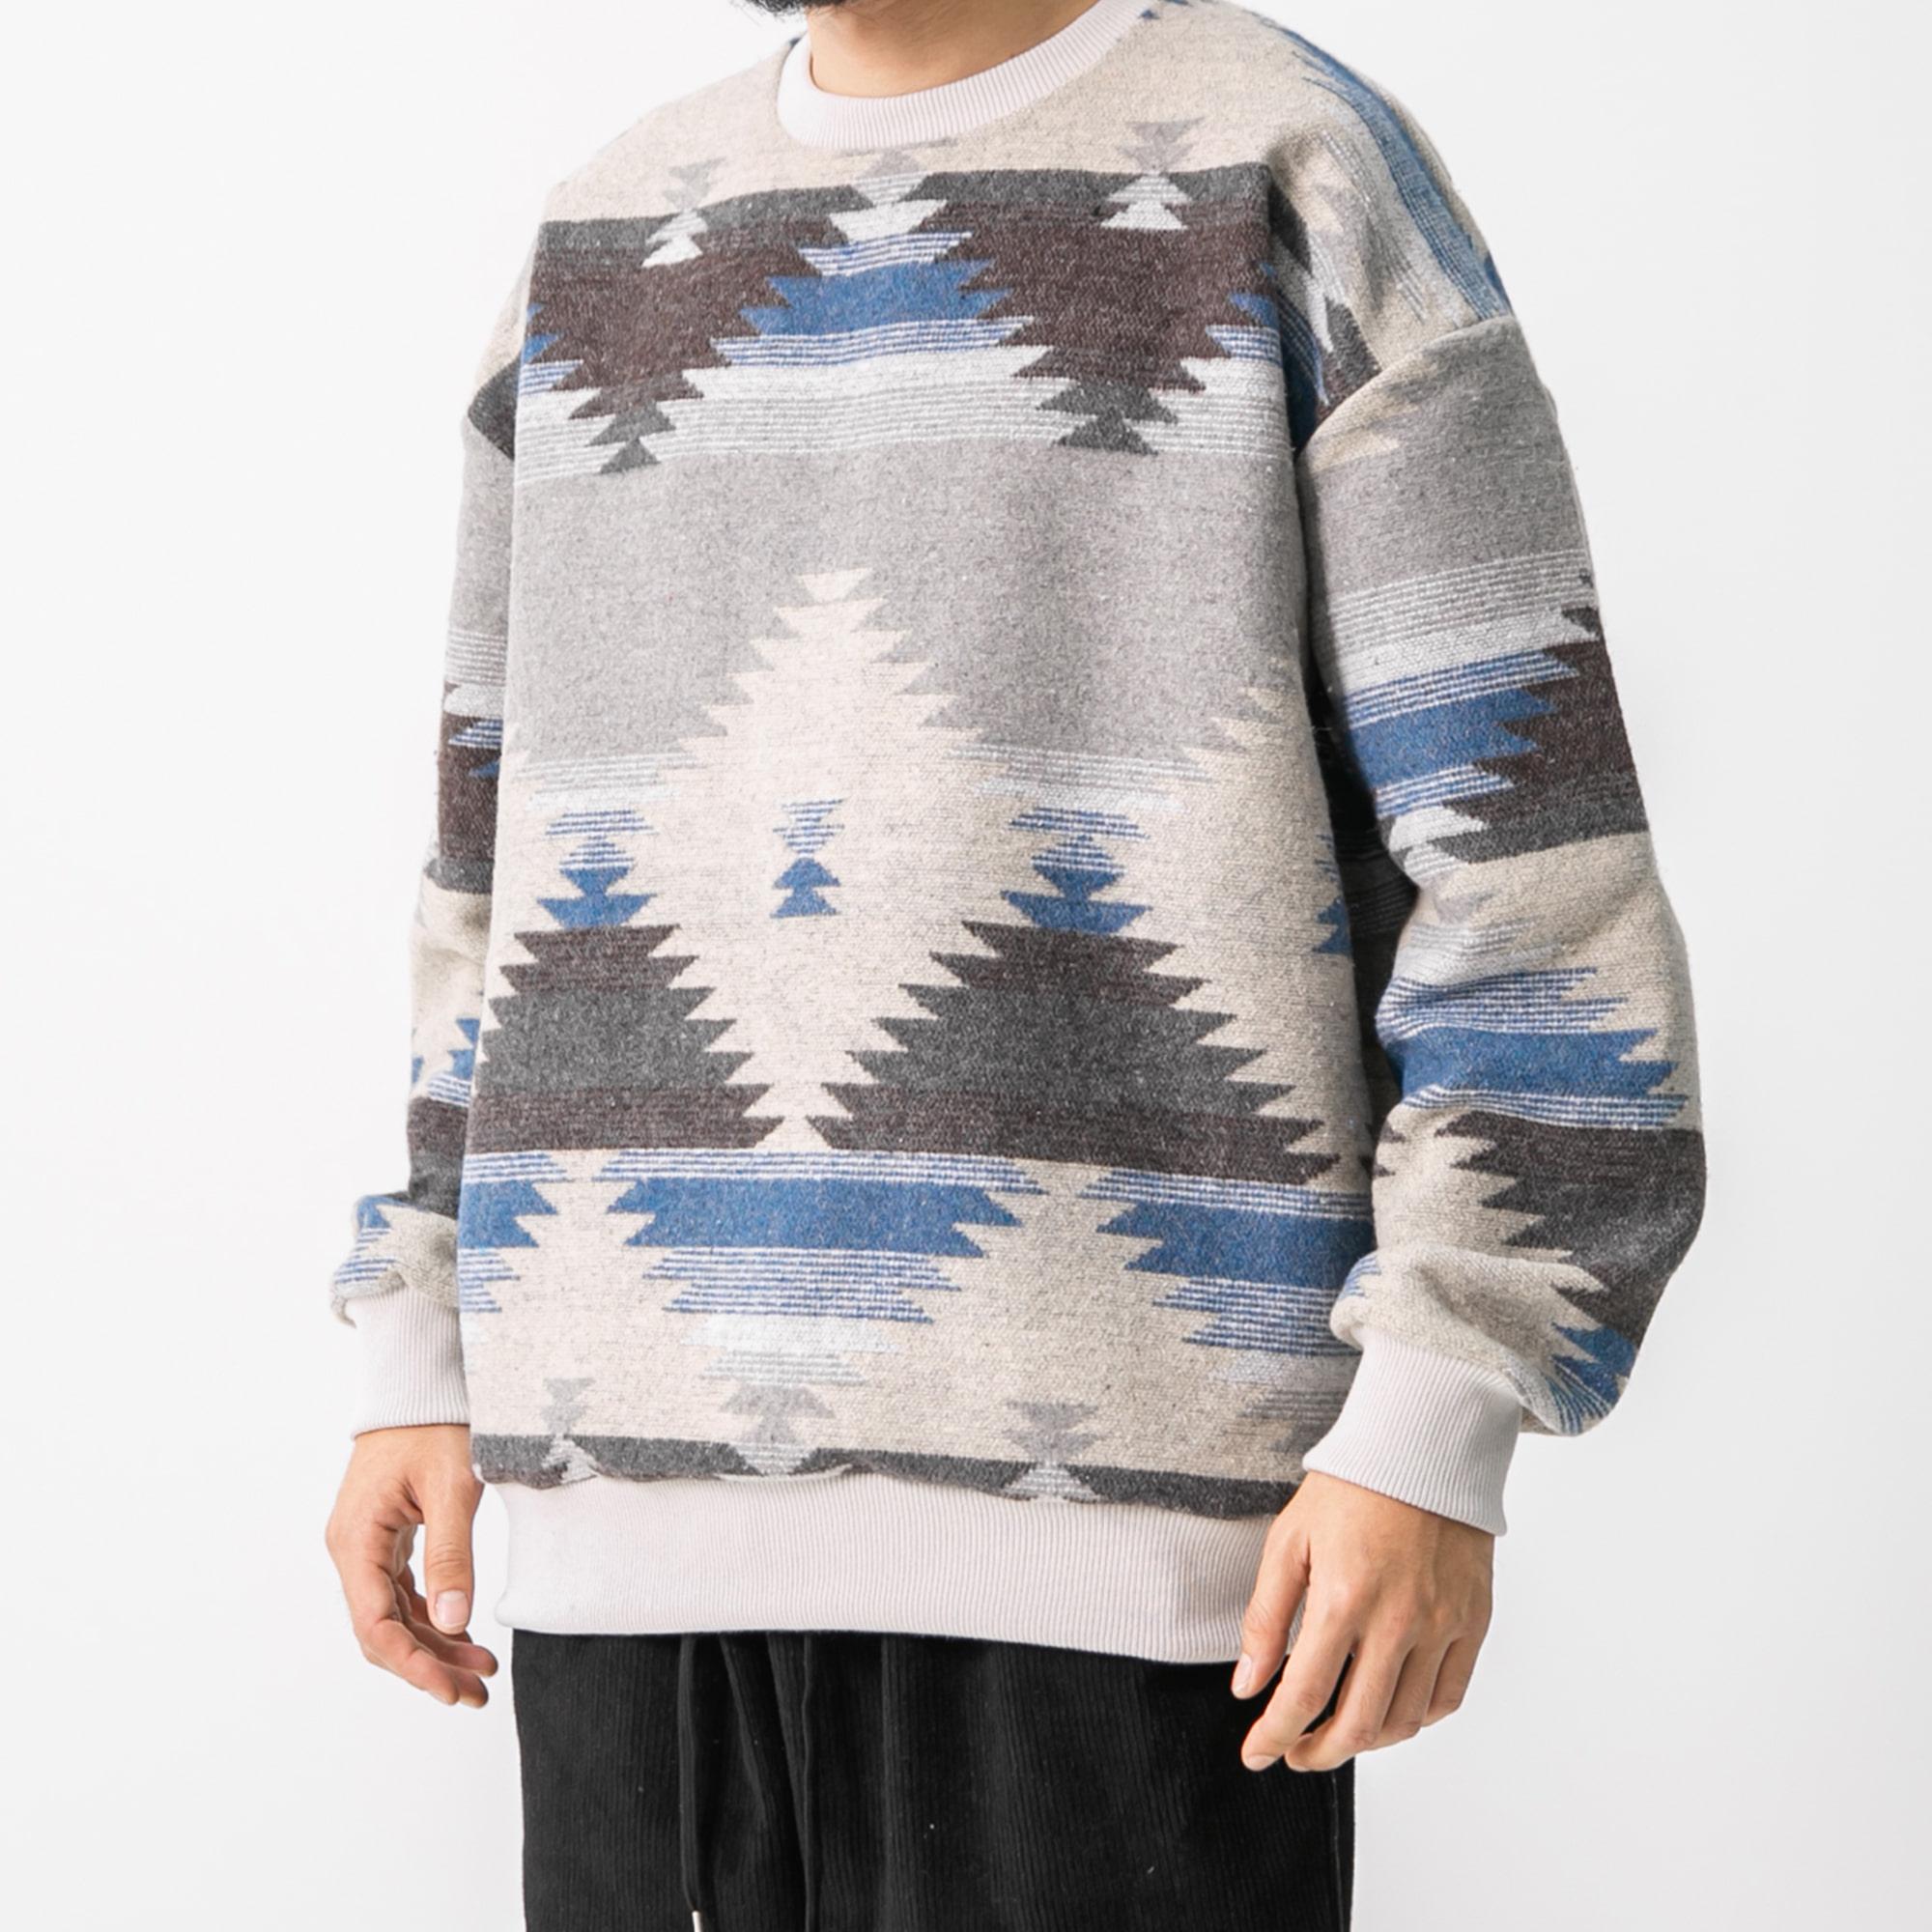 Ethnic Sweat Shirt - Blue